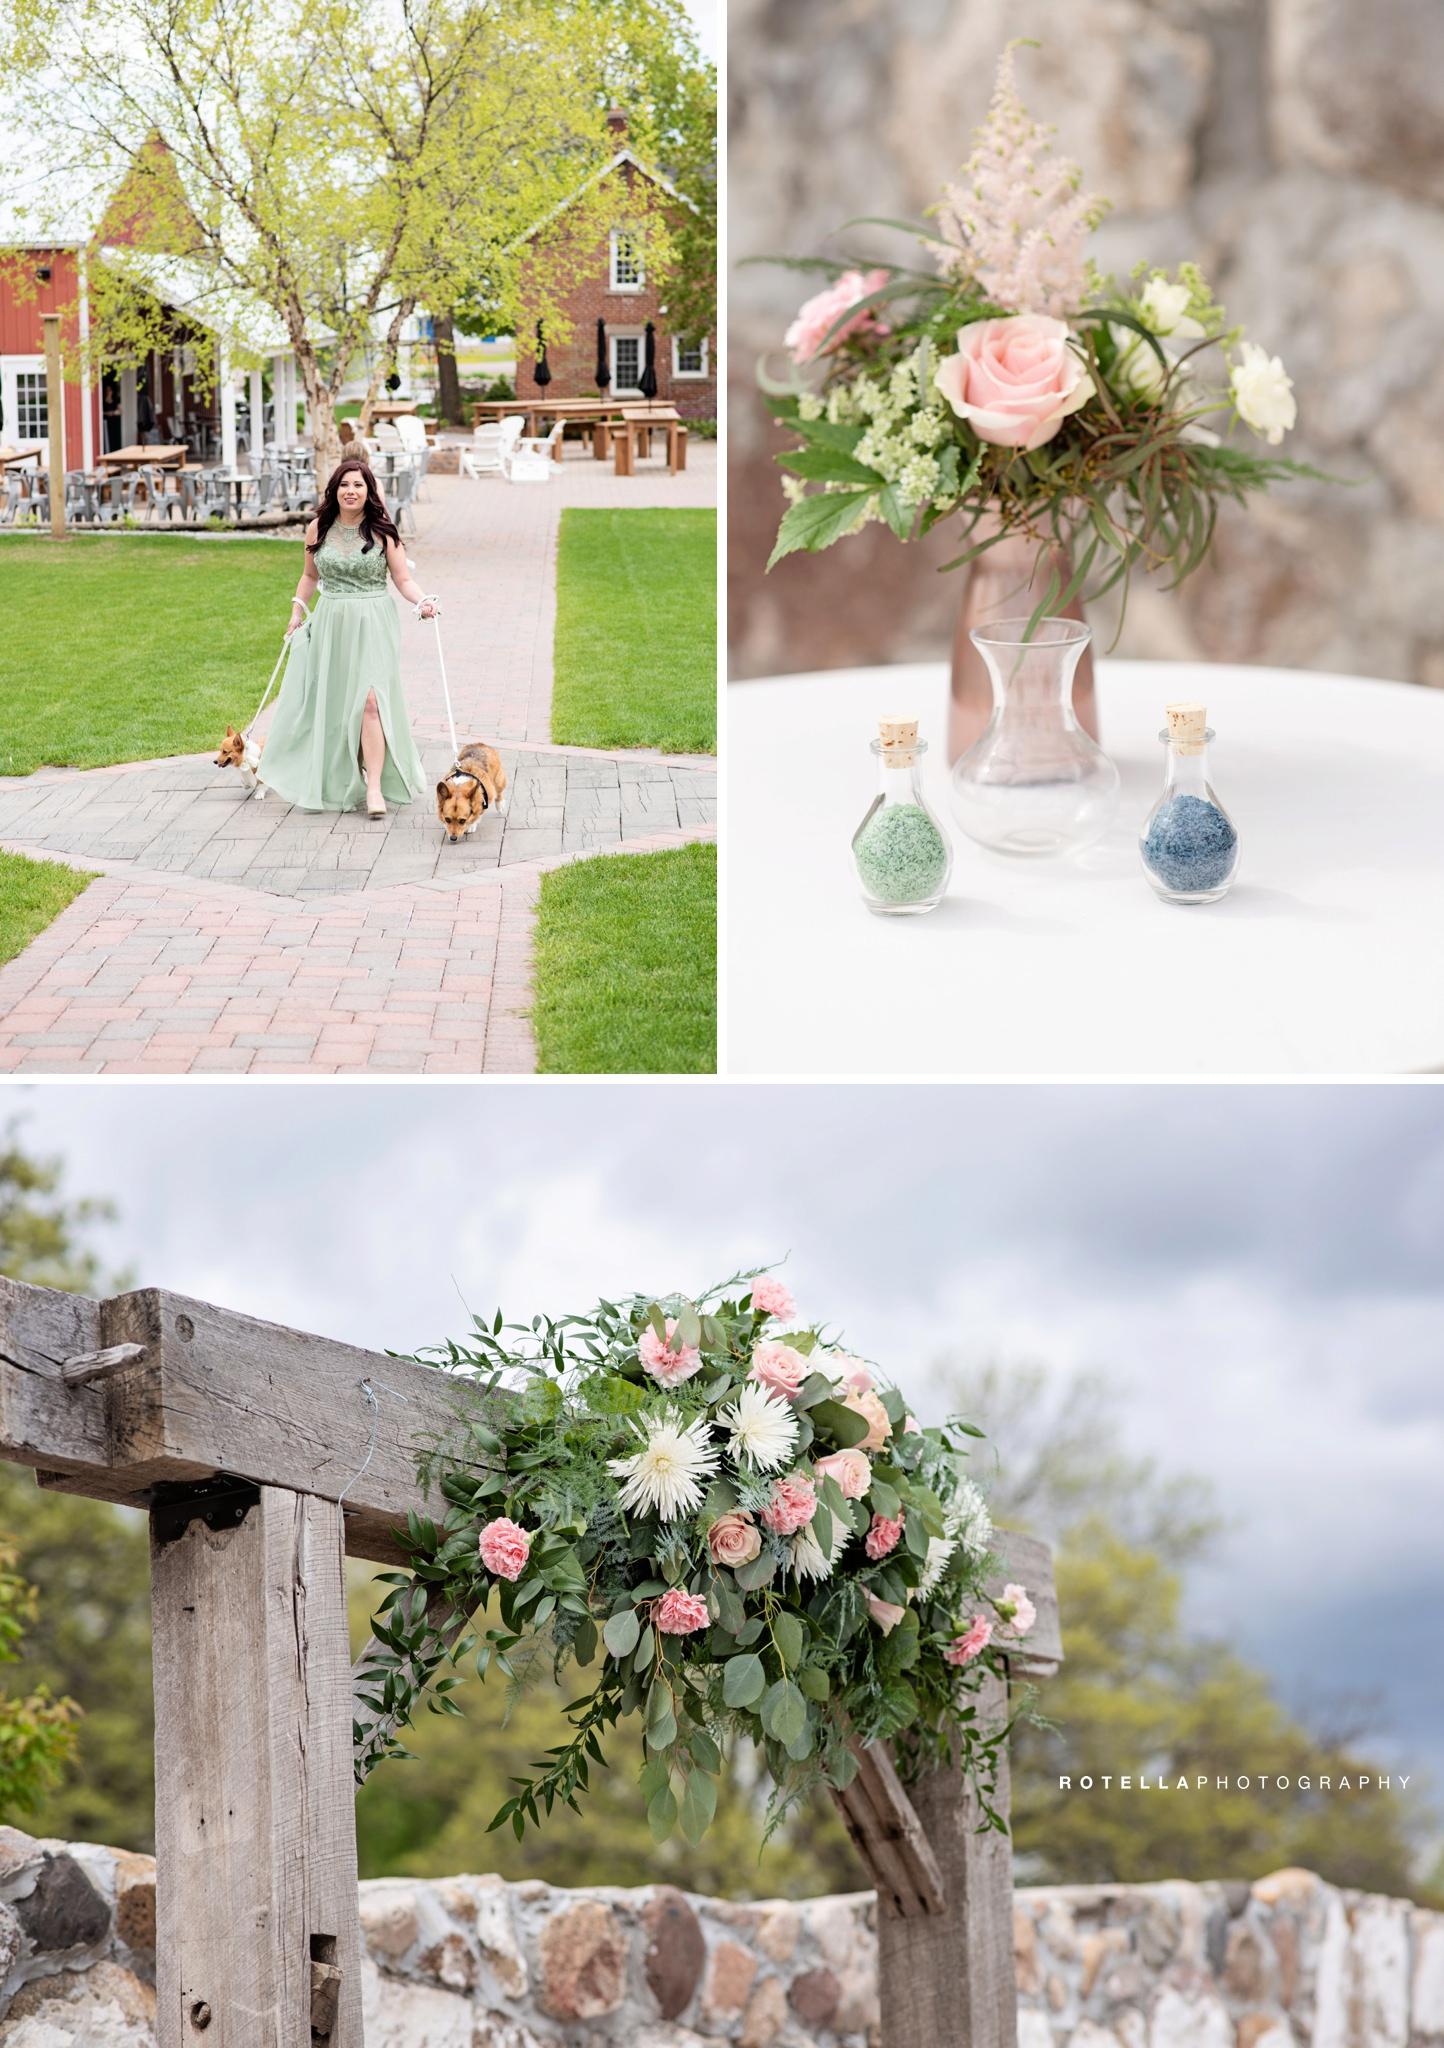 Cassie-Corbin-Wedding-05-25-2019-Rotella-Photography-PREV-97-711_BLOG.jpg